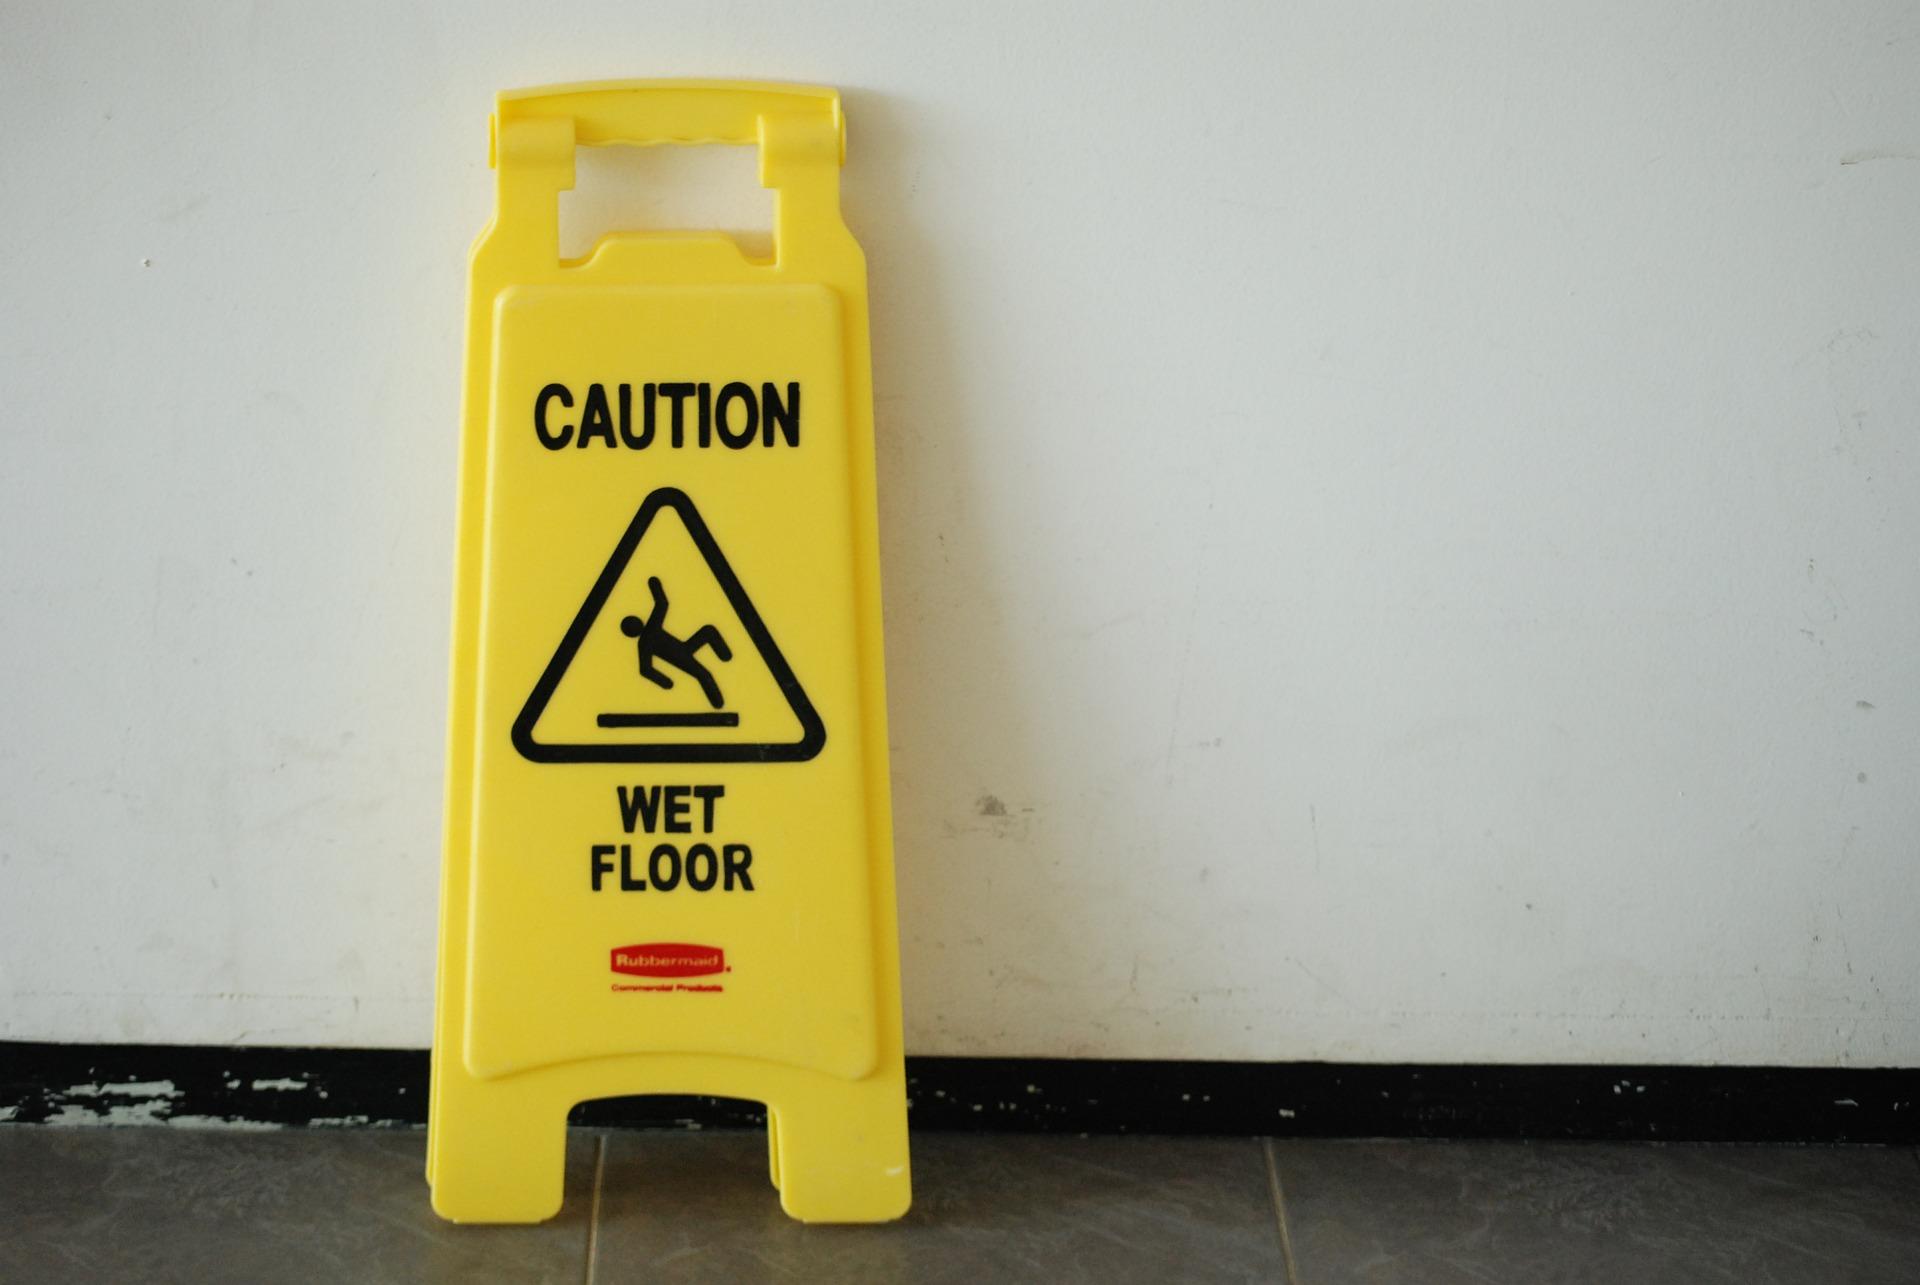 Wet Floor Sign, Caution, Warning